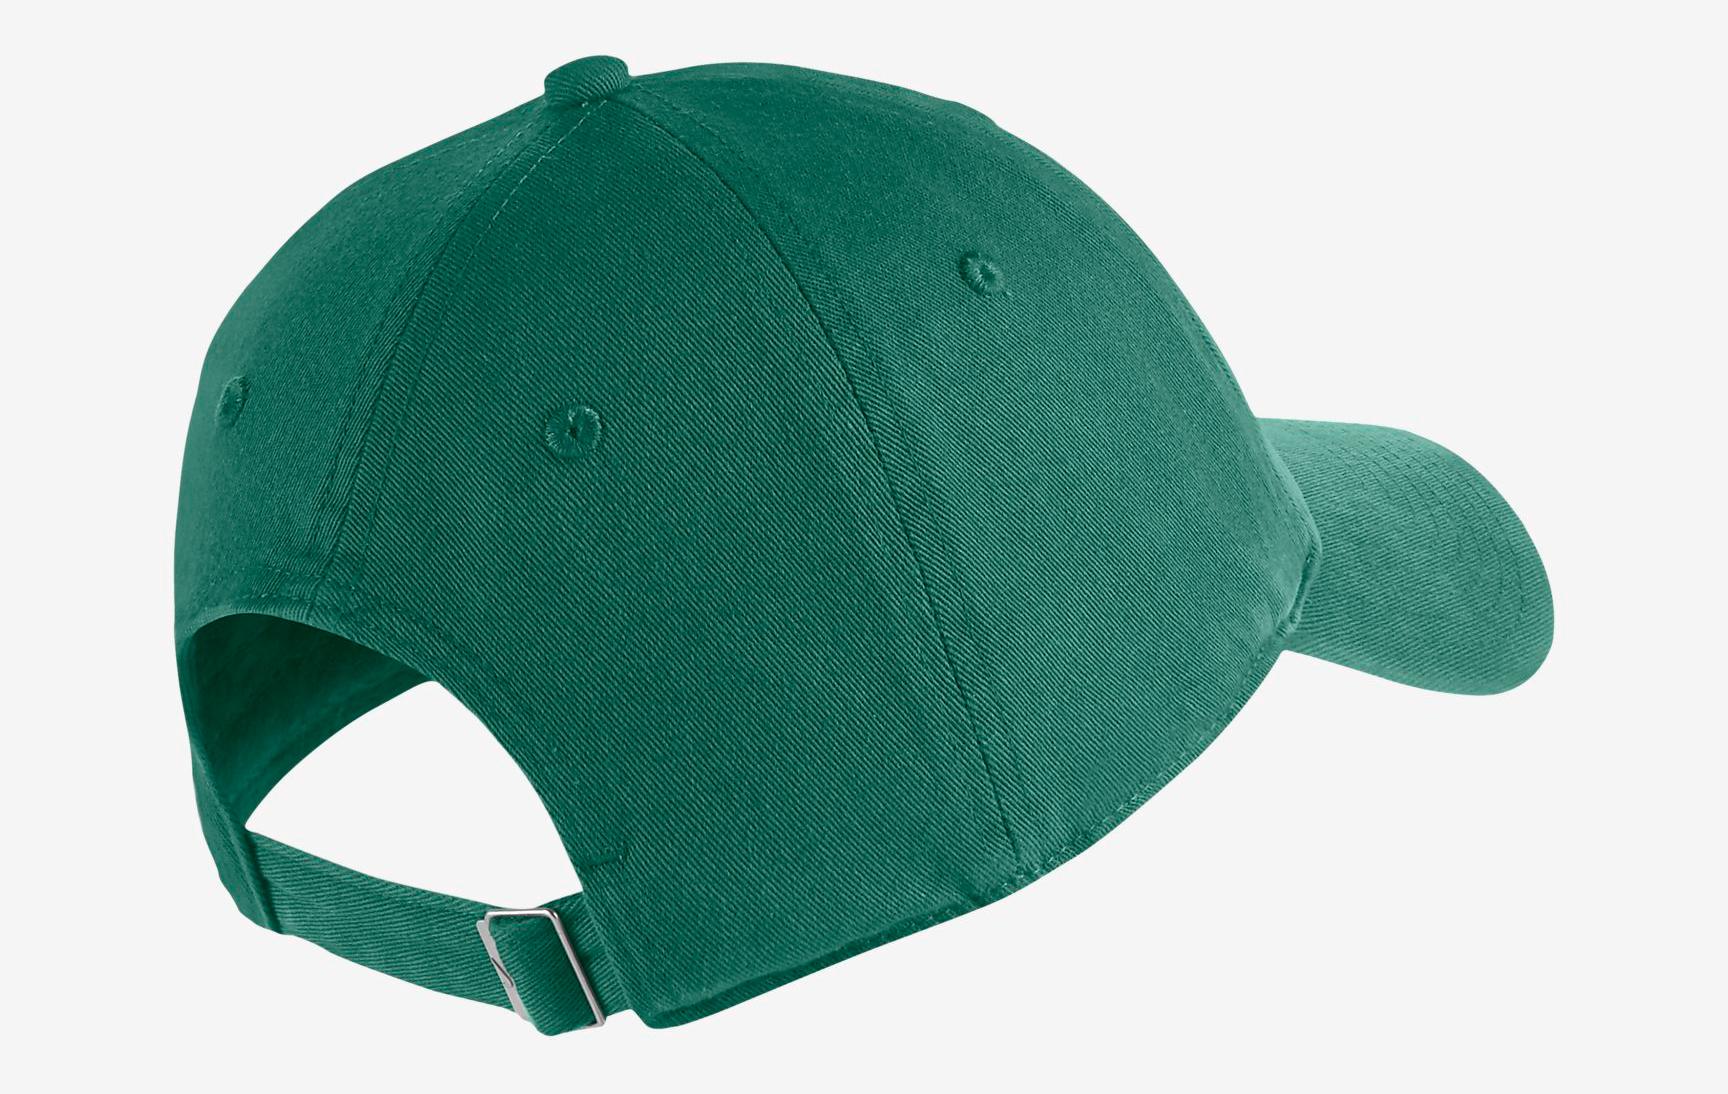 nike watermelon south beach hat match green 2